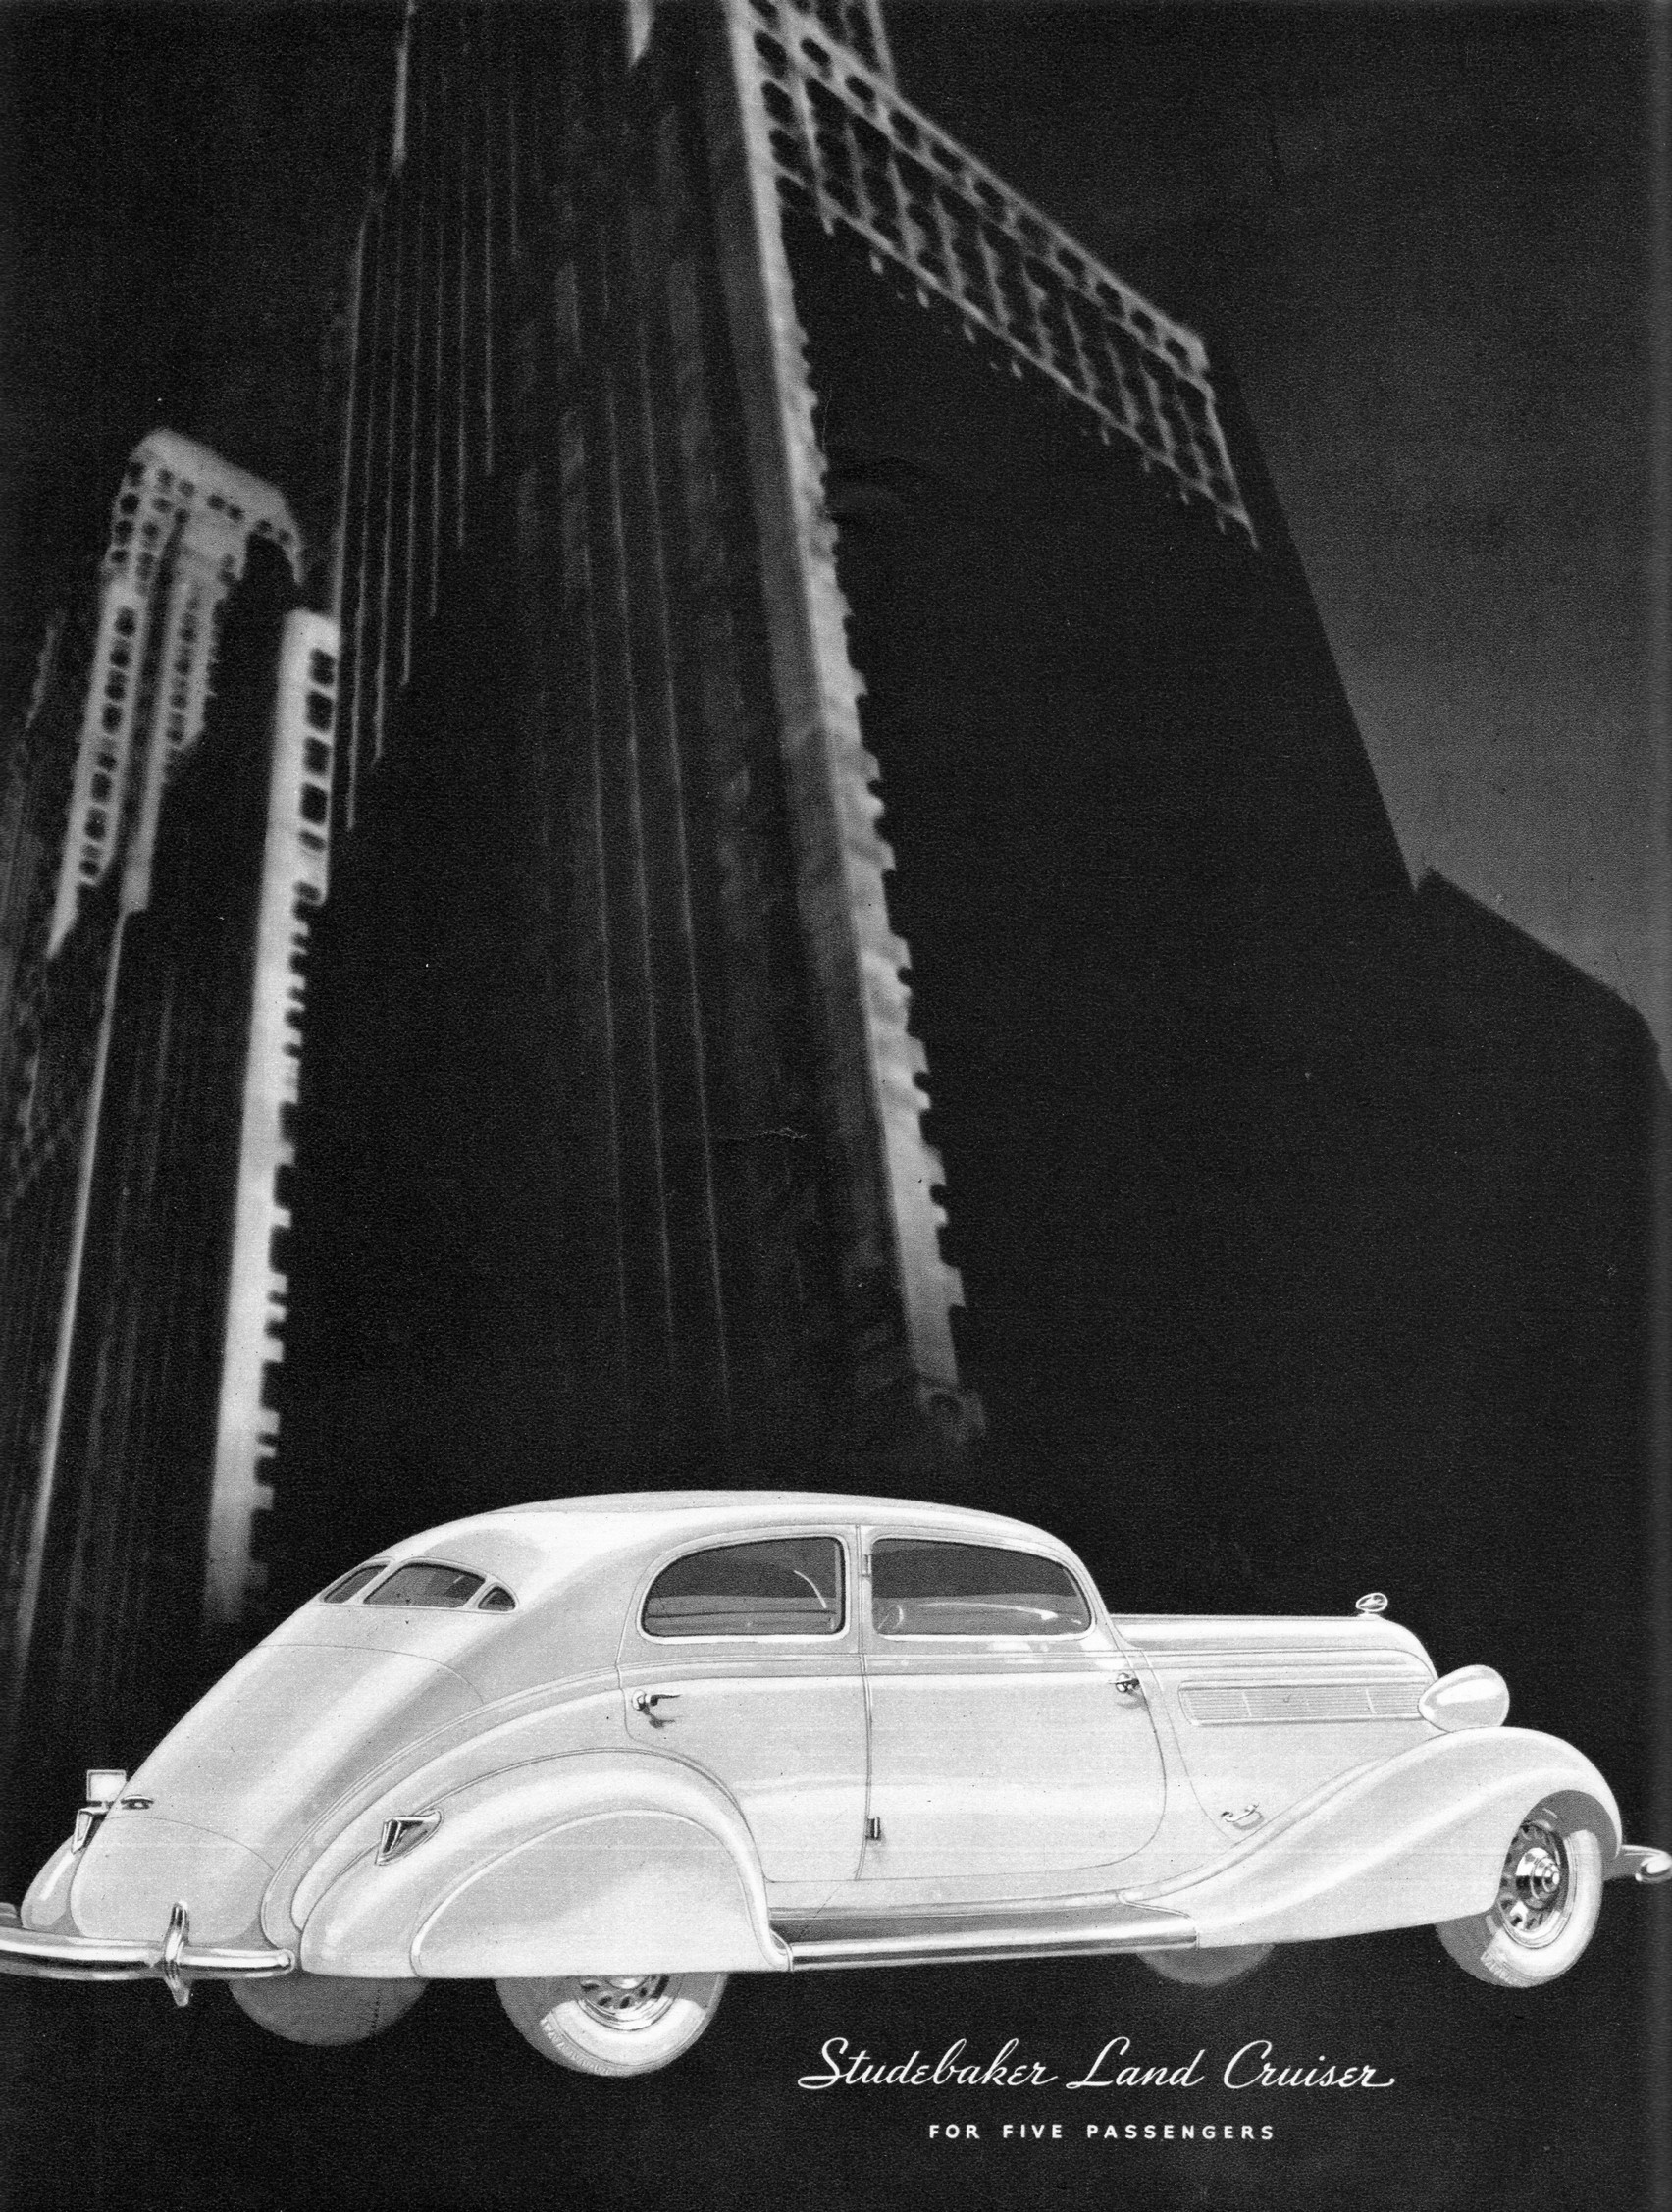 1935 Studebaker Land Cruiser (www.Wayofourfathers.com)